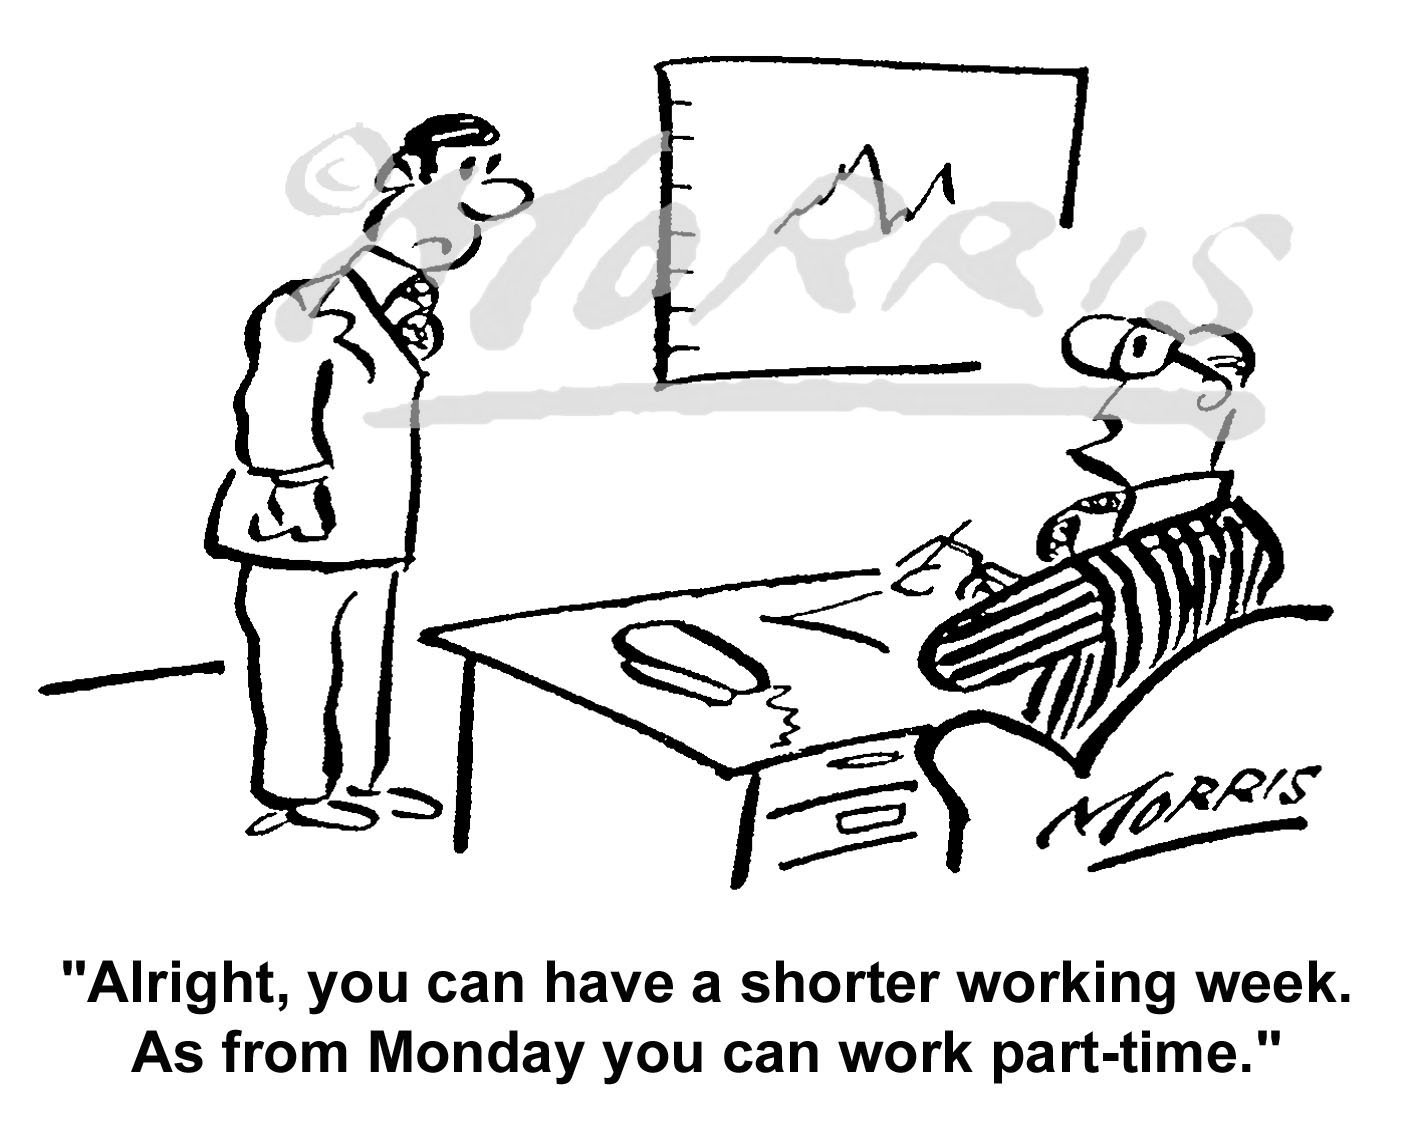 Shorter working week cartoon, reduced hours comic cartoon – Ref: 5142bw